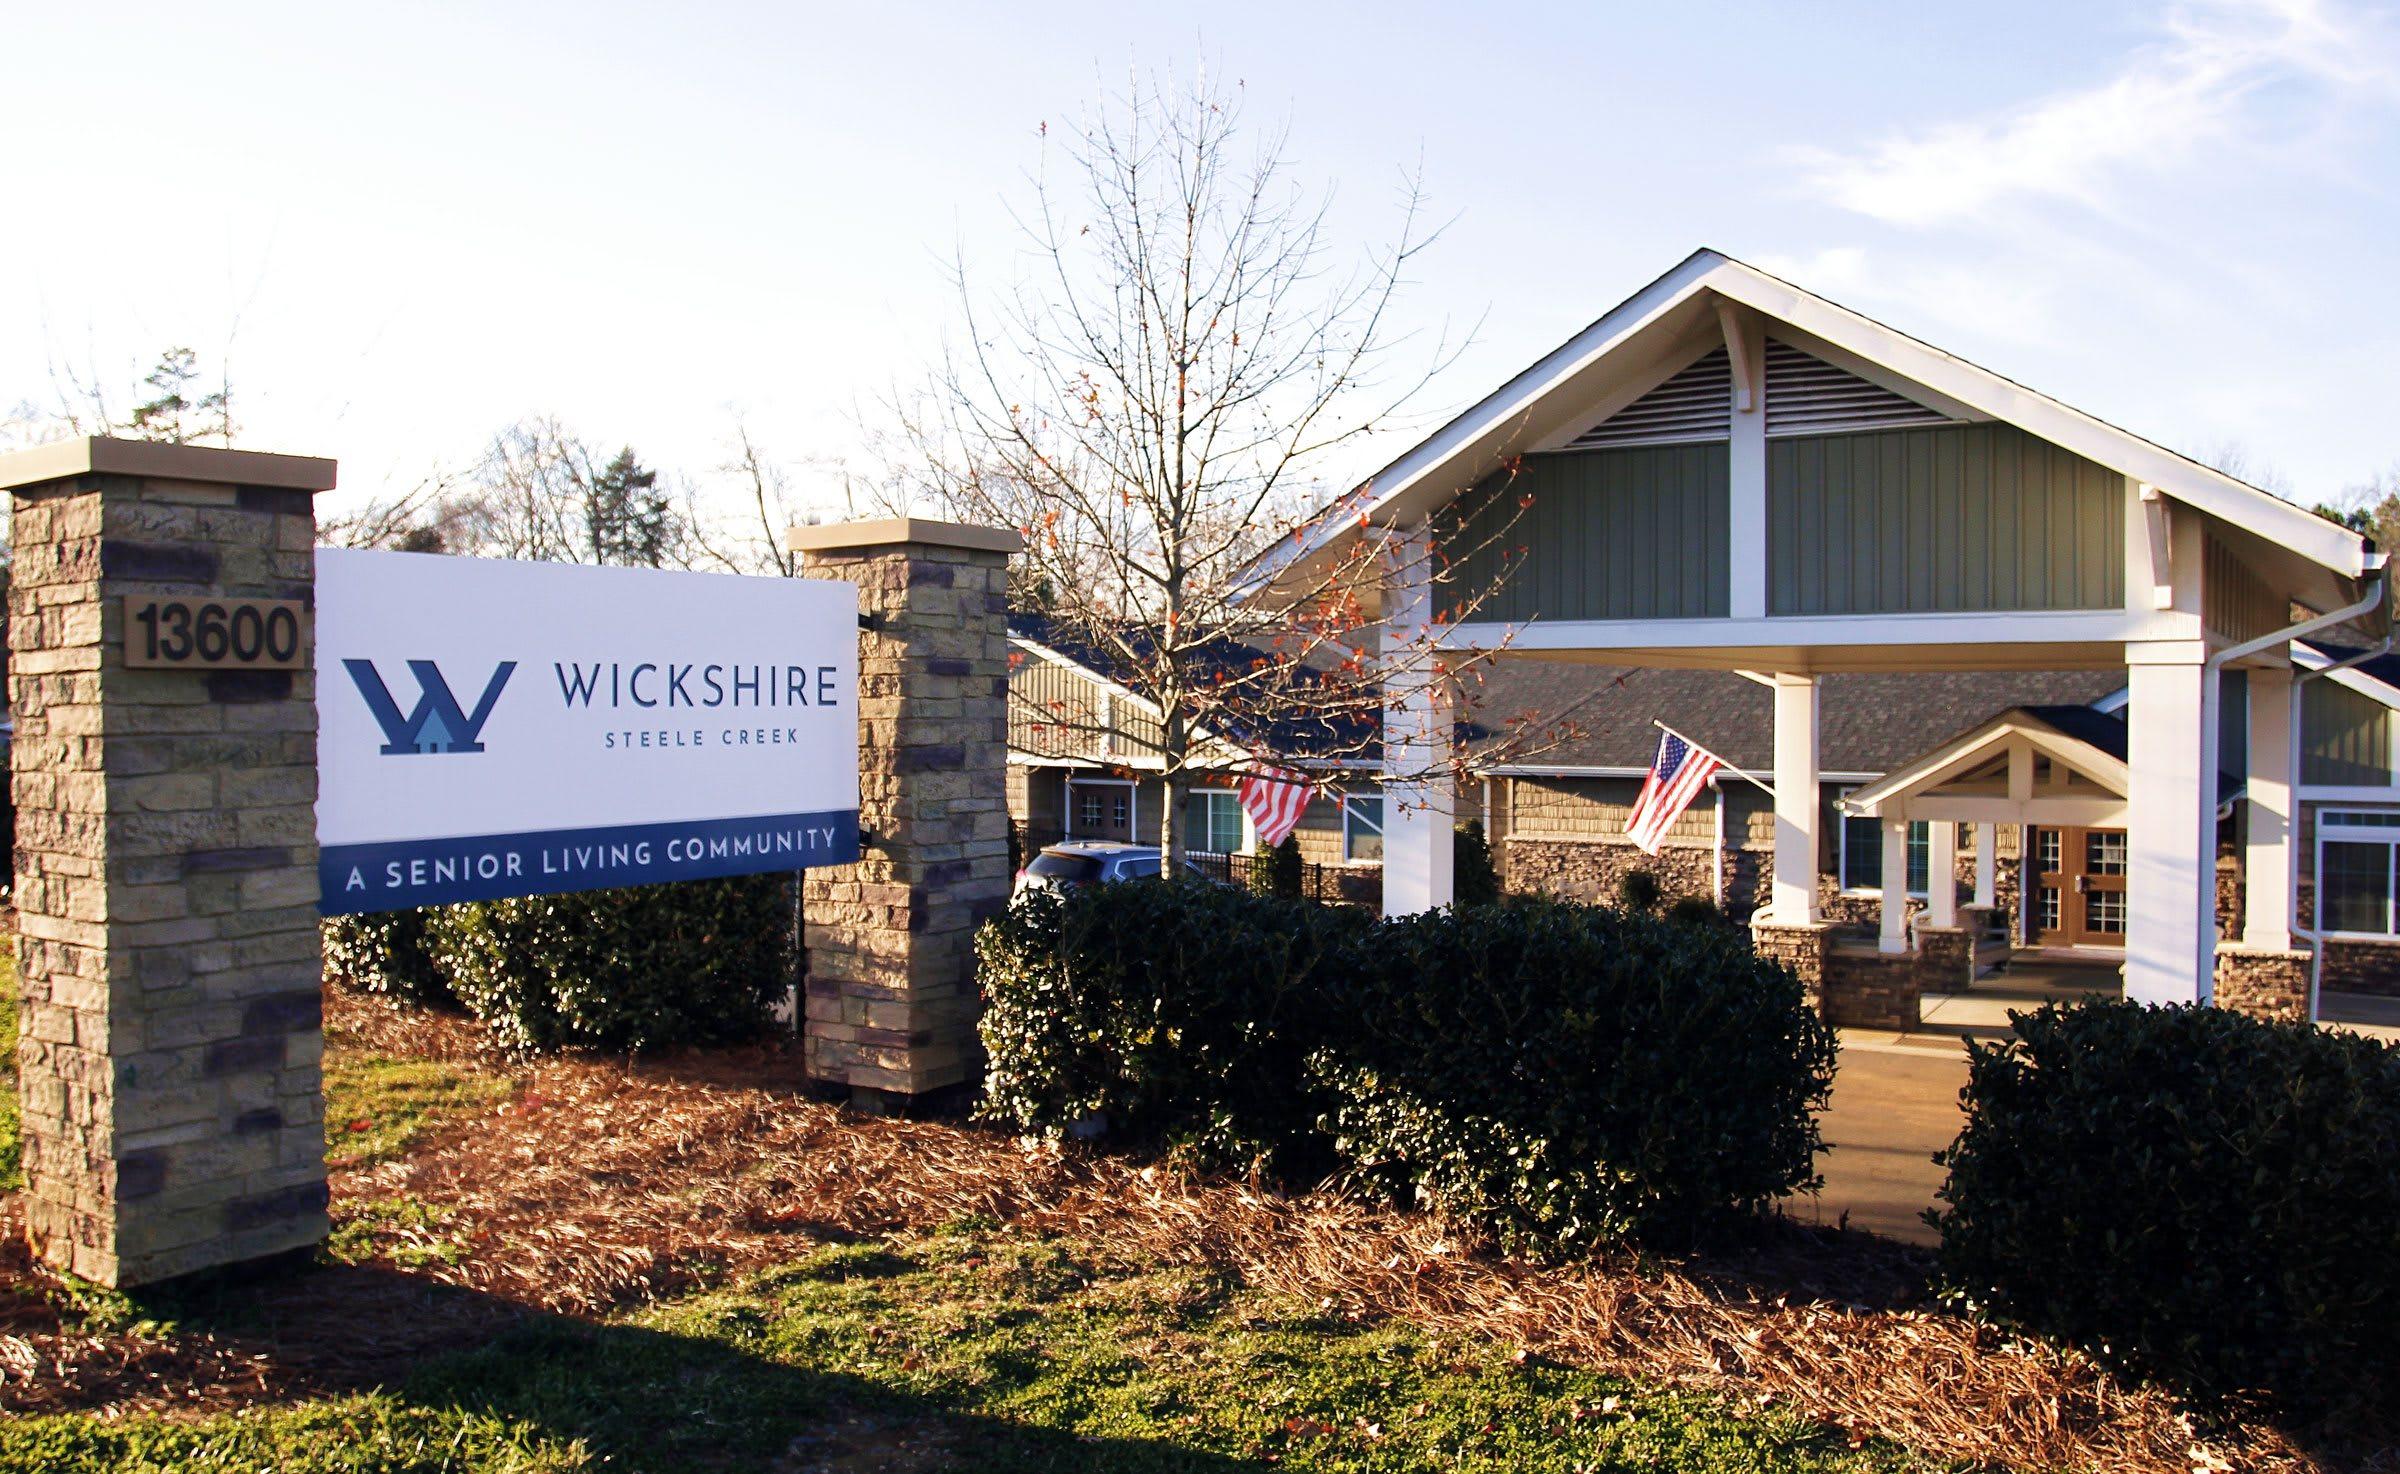 Photo 1 of Wickshire Steele Creek